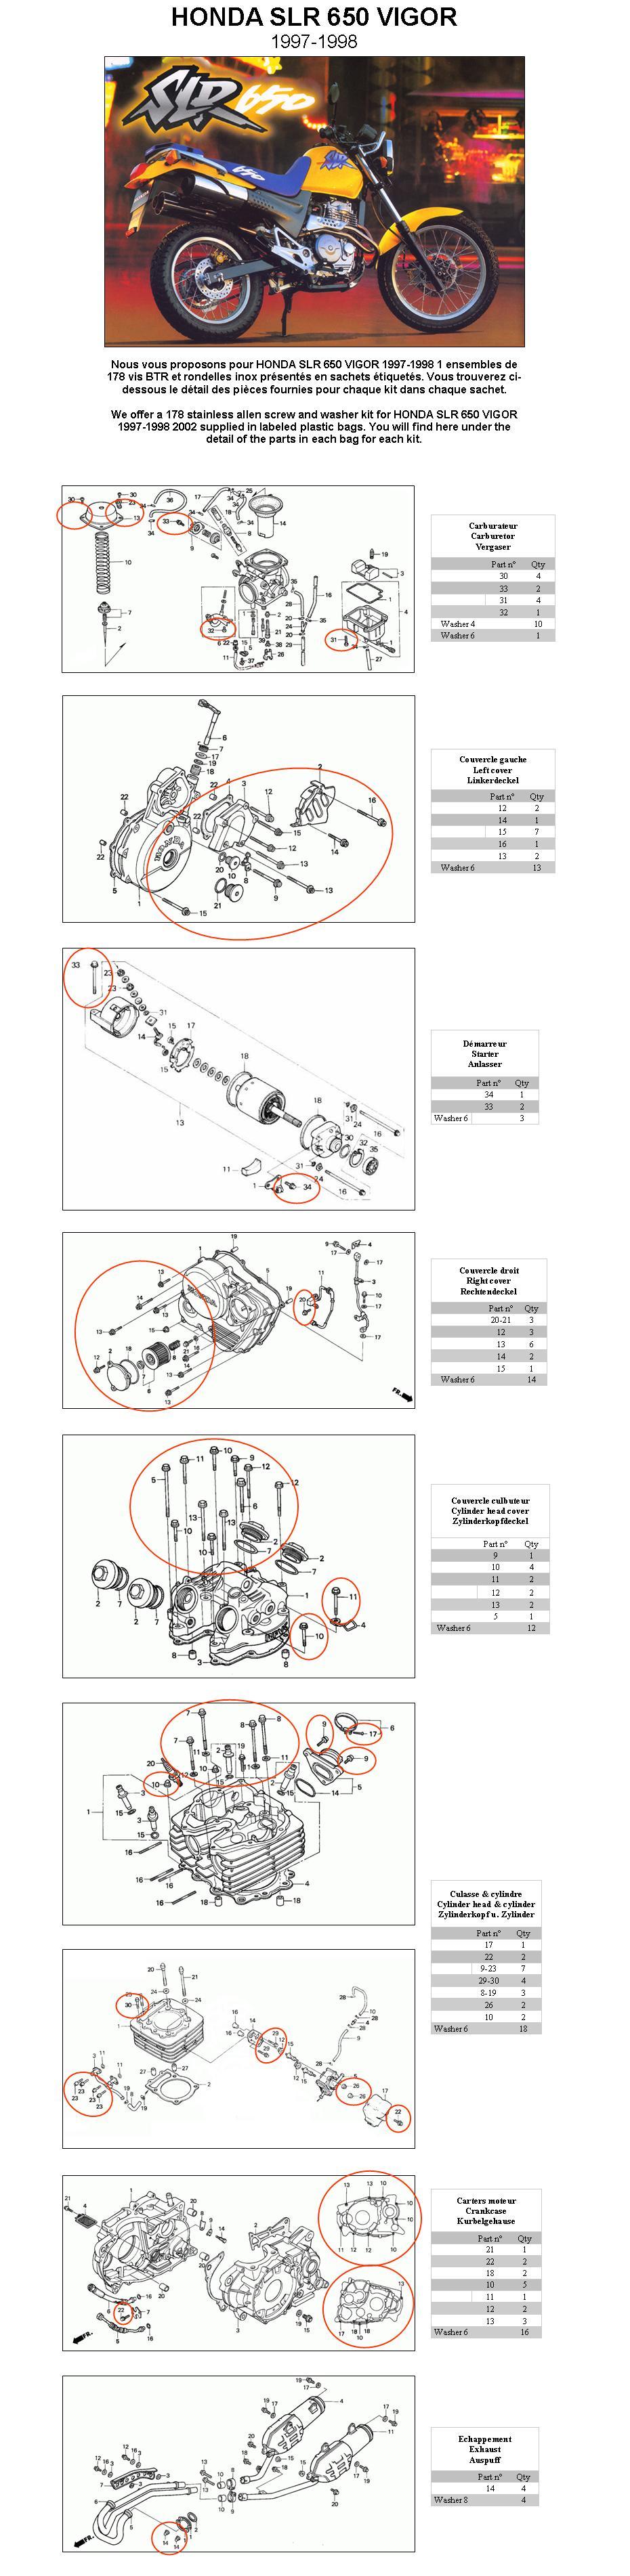 HONDA NX 250 DOMINATOR 1988-1998 Komplettmotor Inbus Rostfrei Schraubensatz